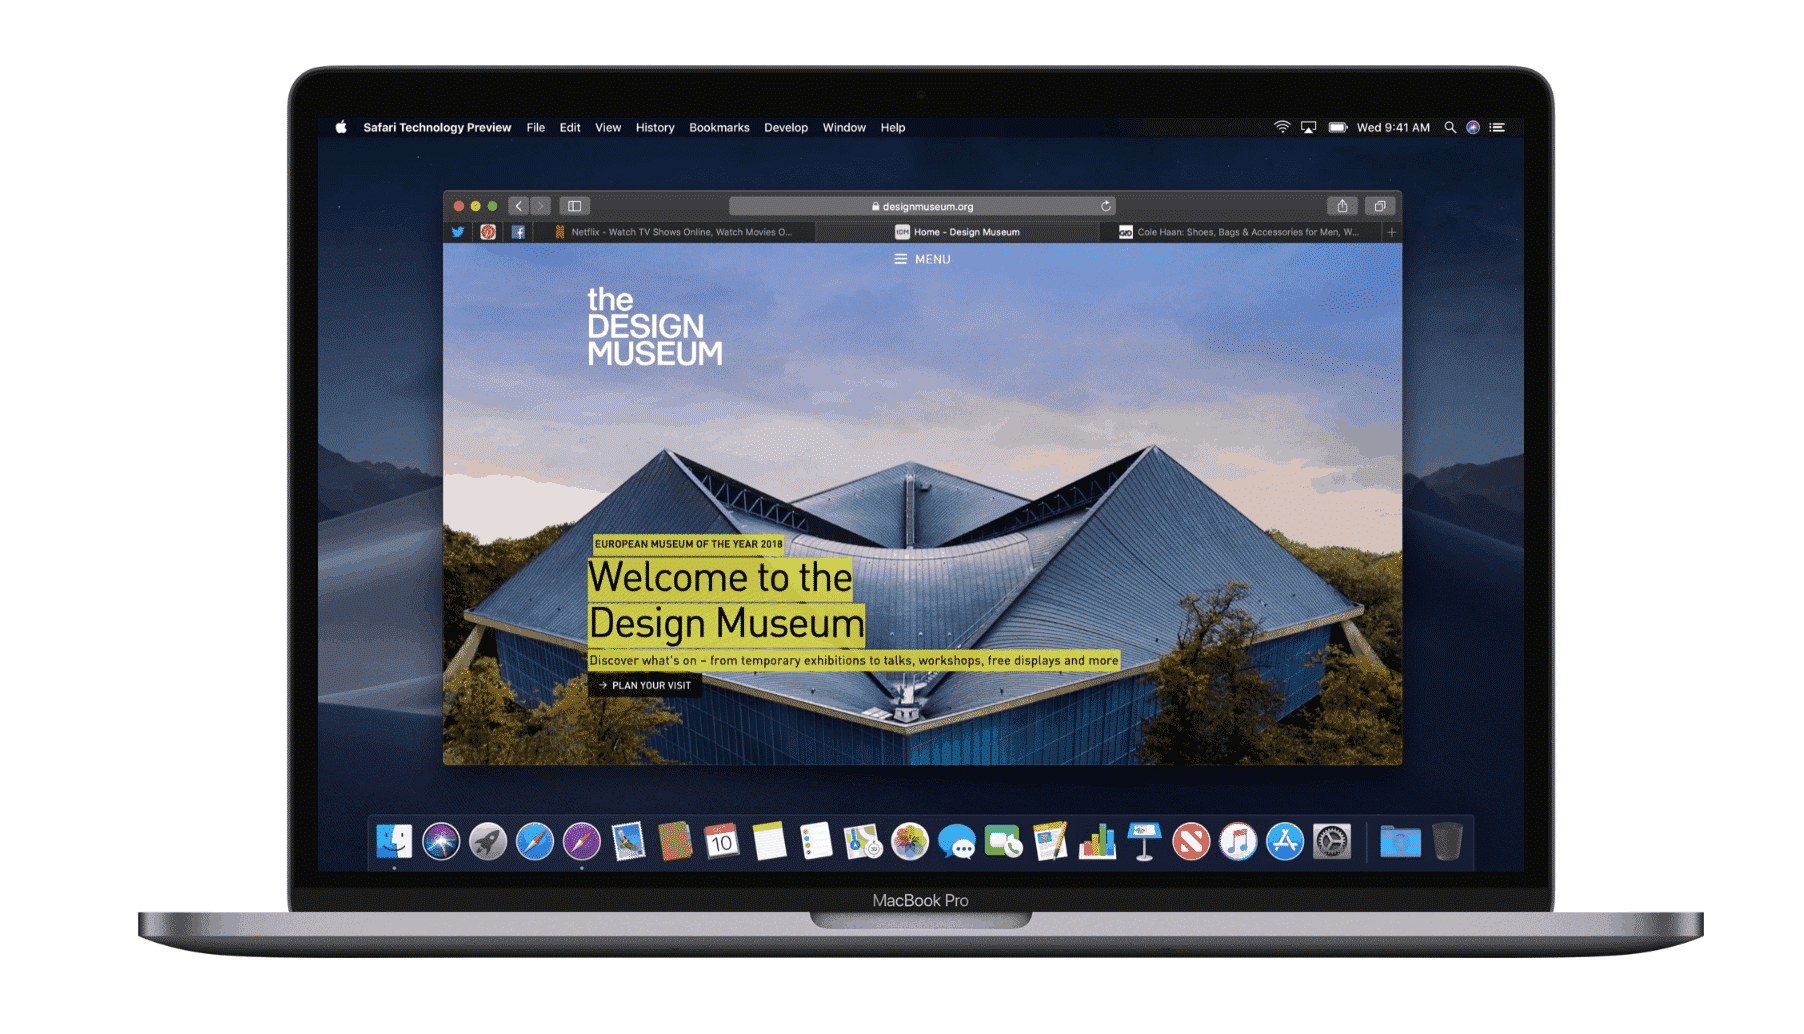 Safari Technology Update Preview 83